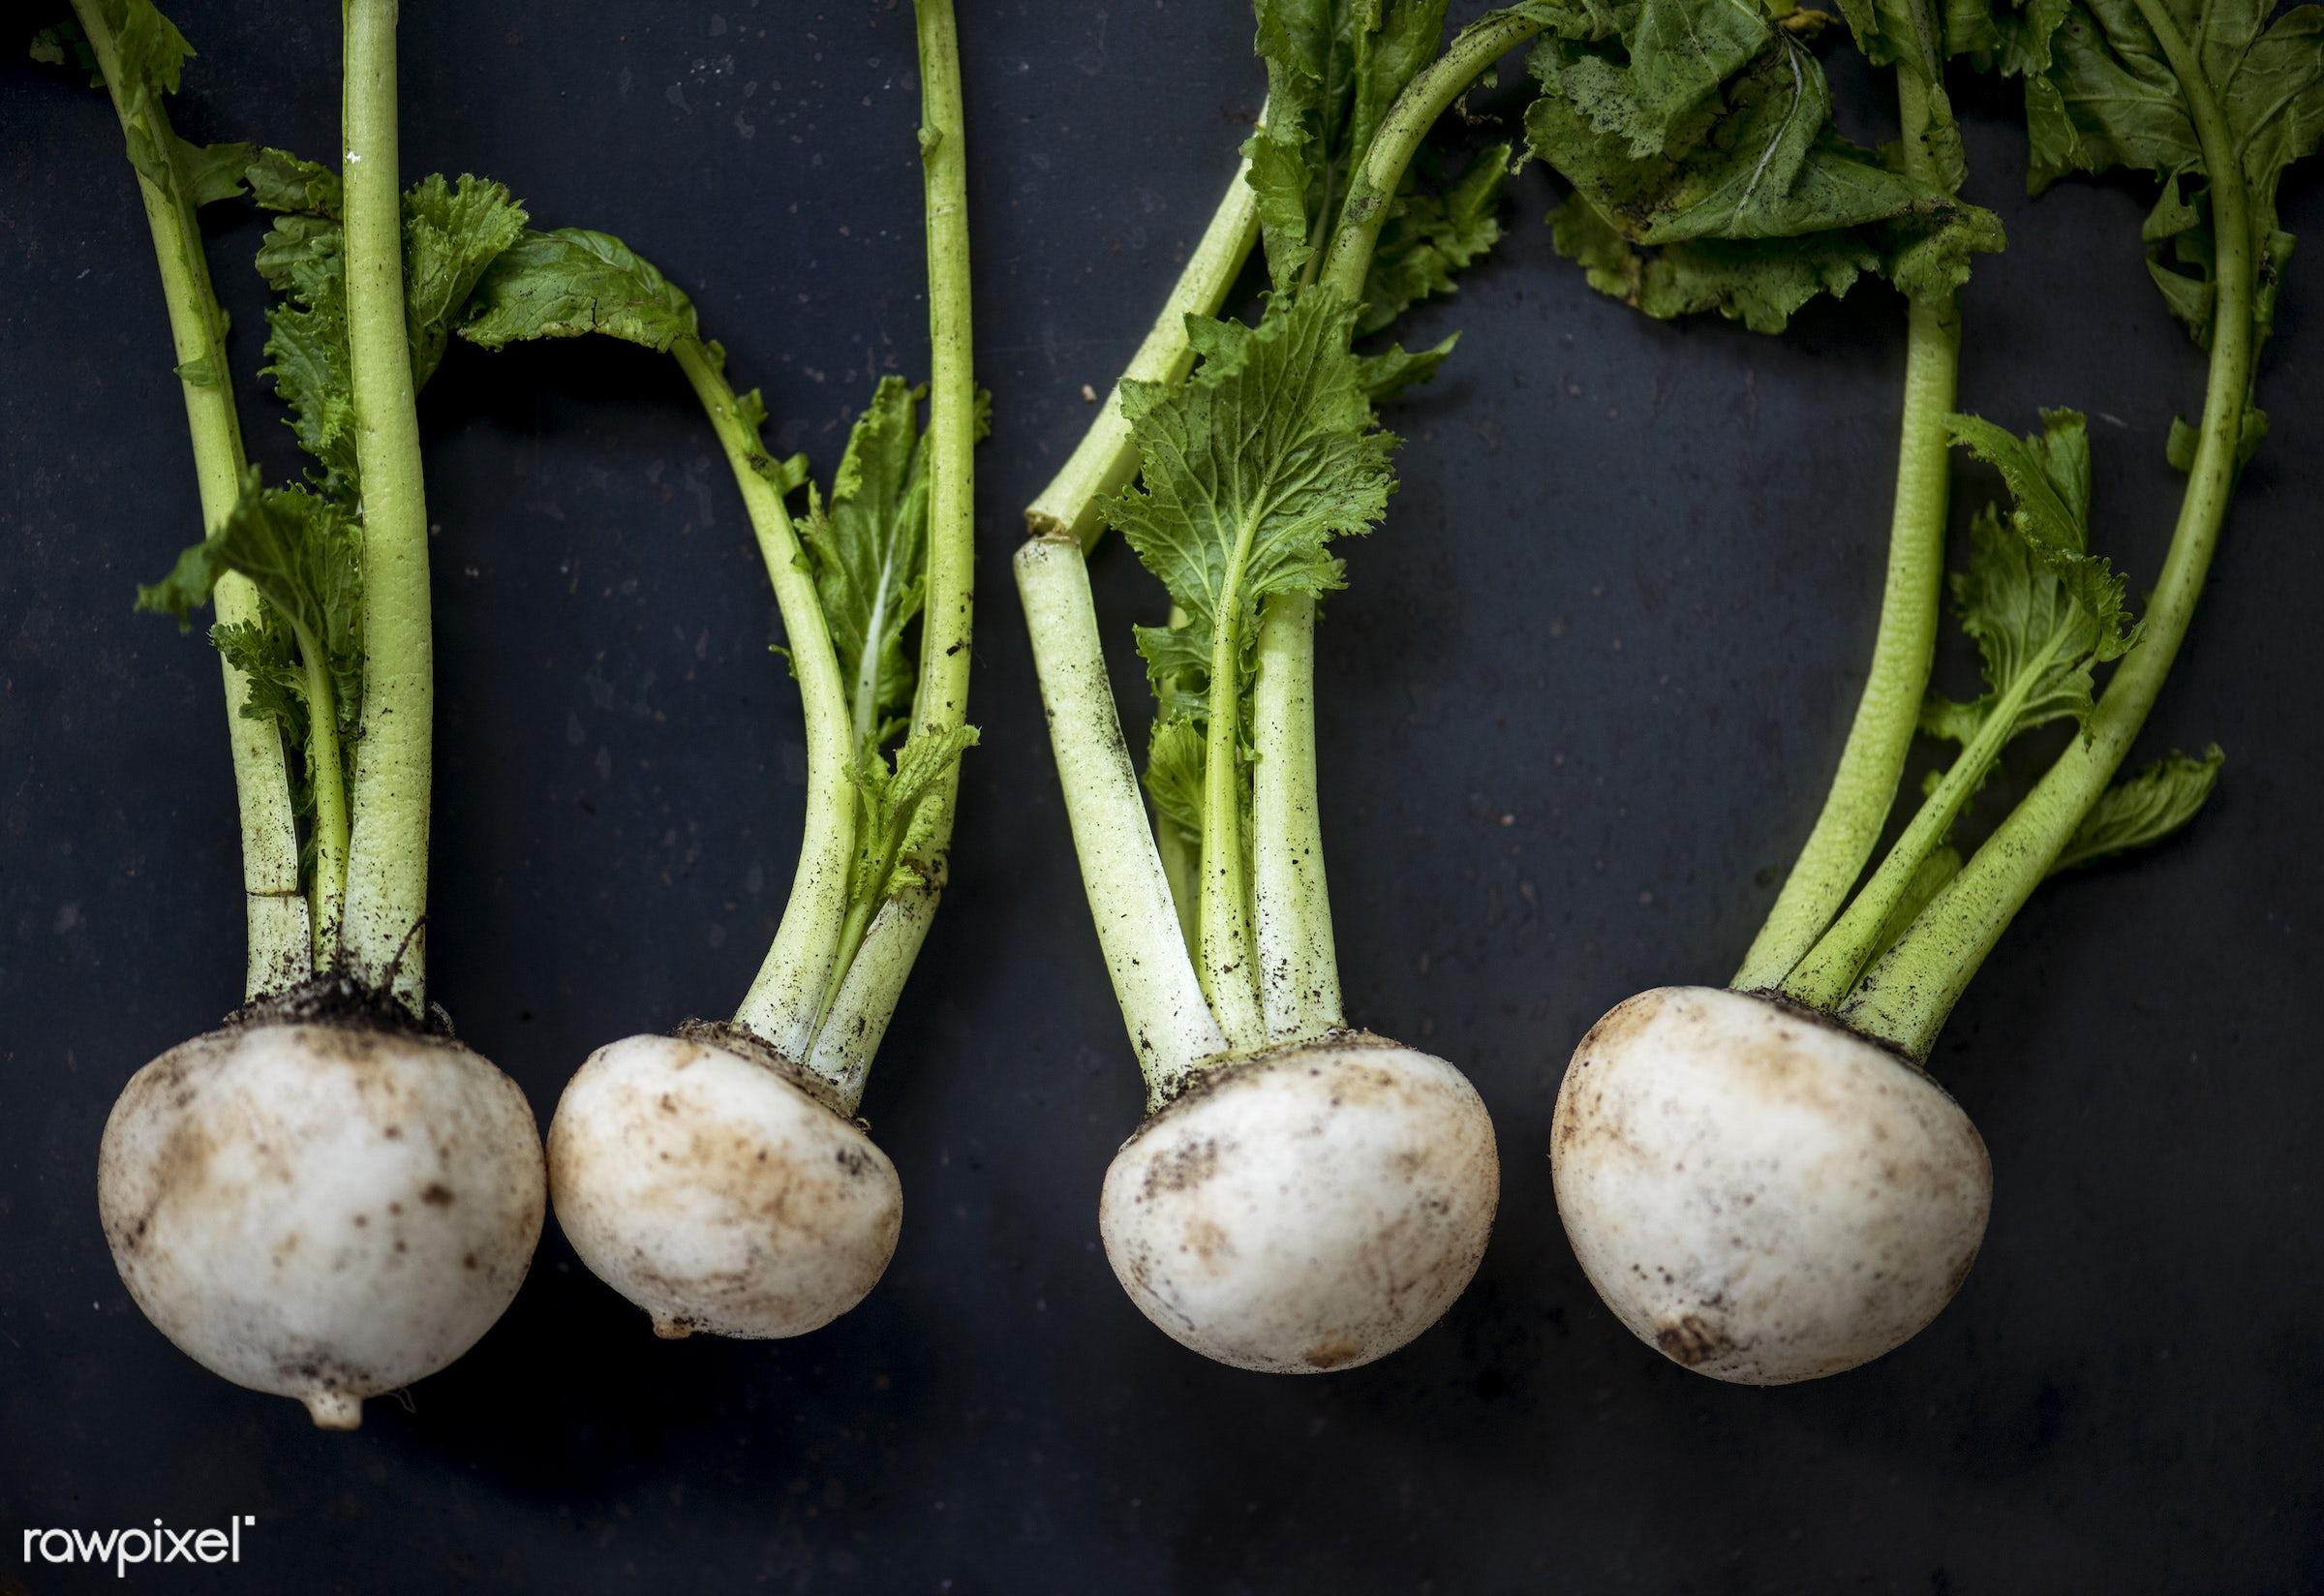 raw, turnips, type, gastronomy, kind, fresh, vegetarian, cooking, ingredient, gourmet, nourishment, vegetables, culinary,...